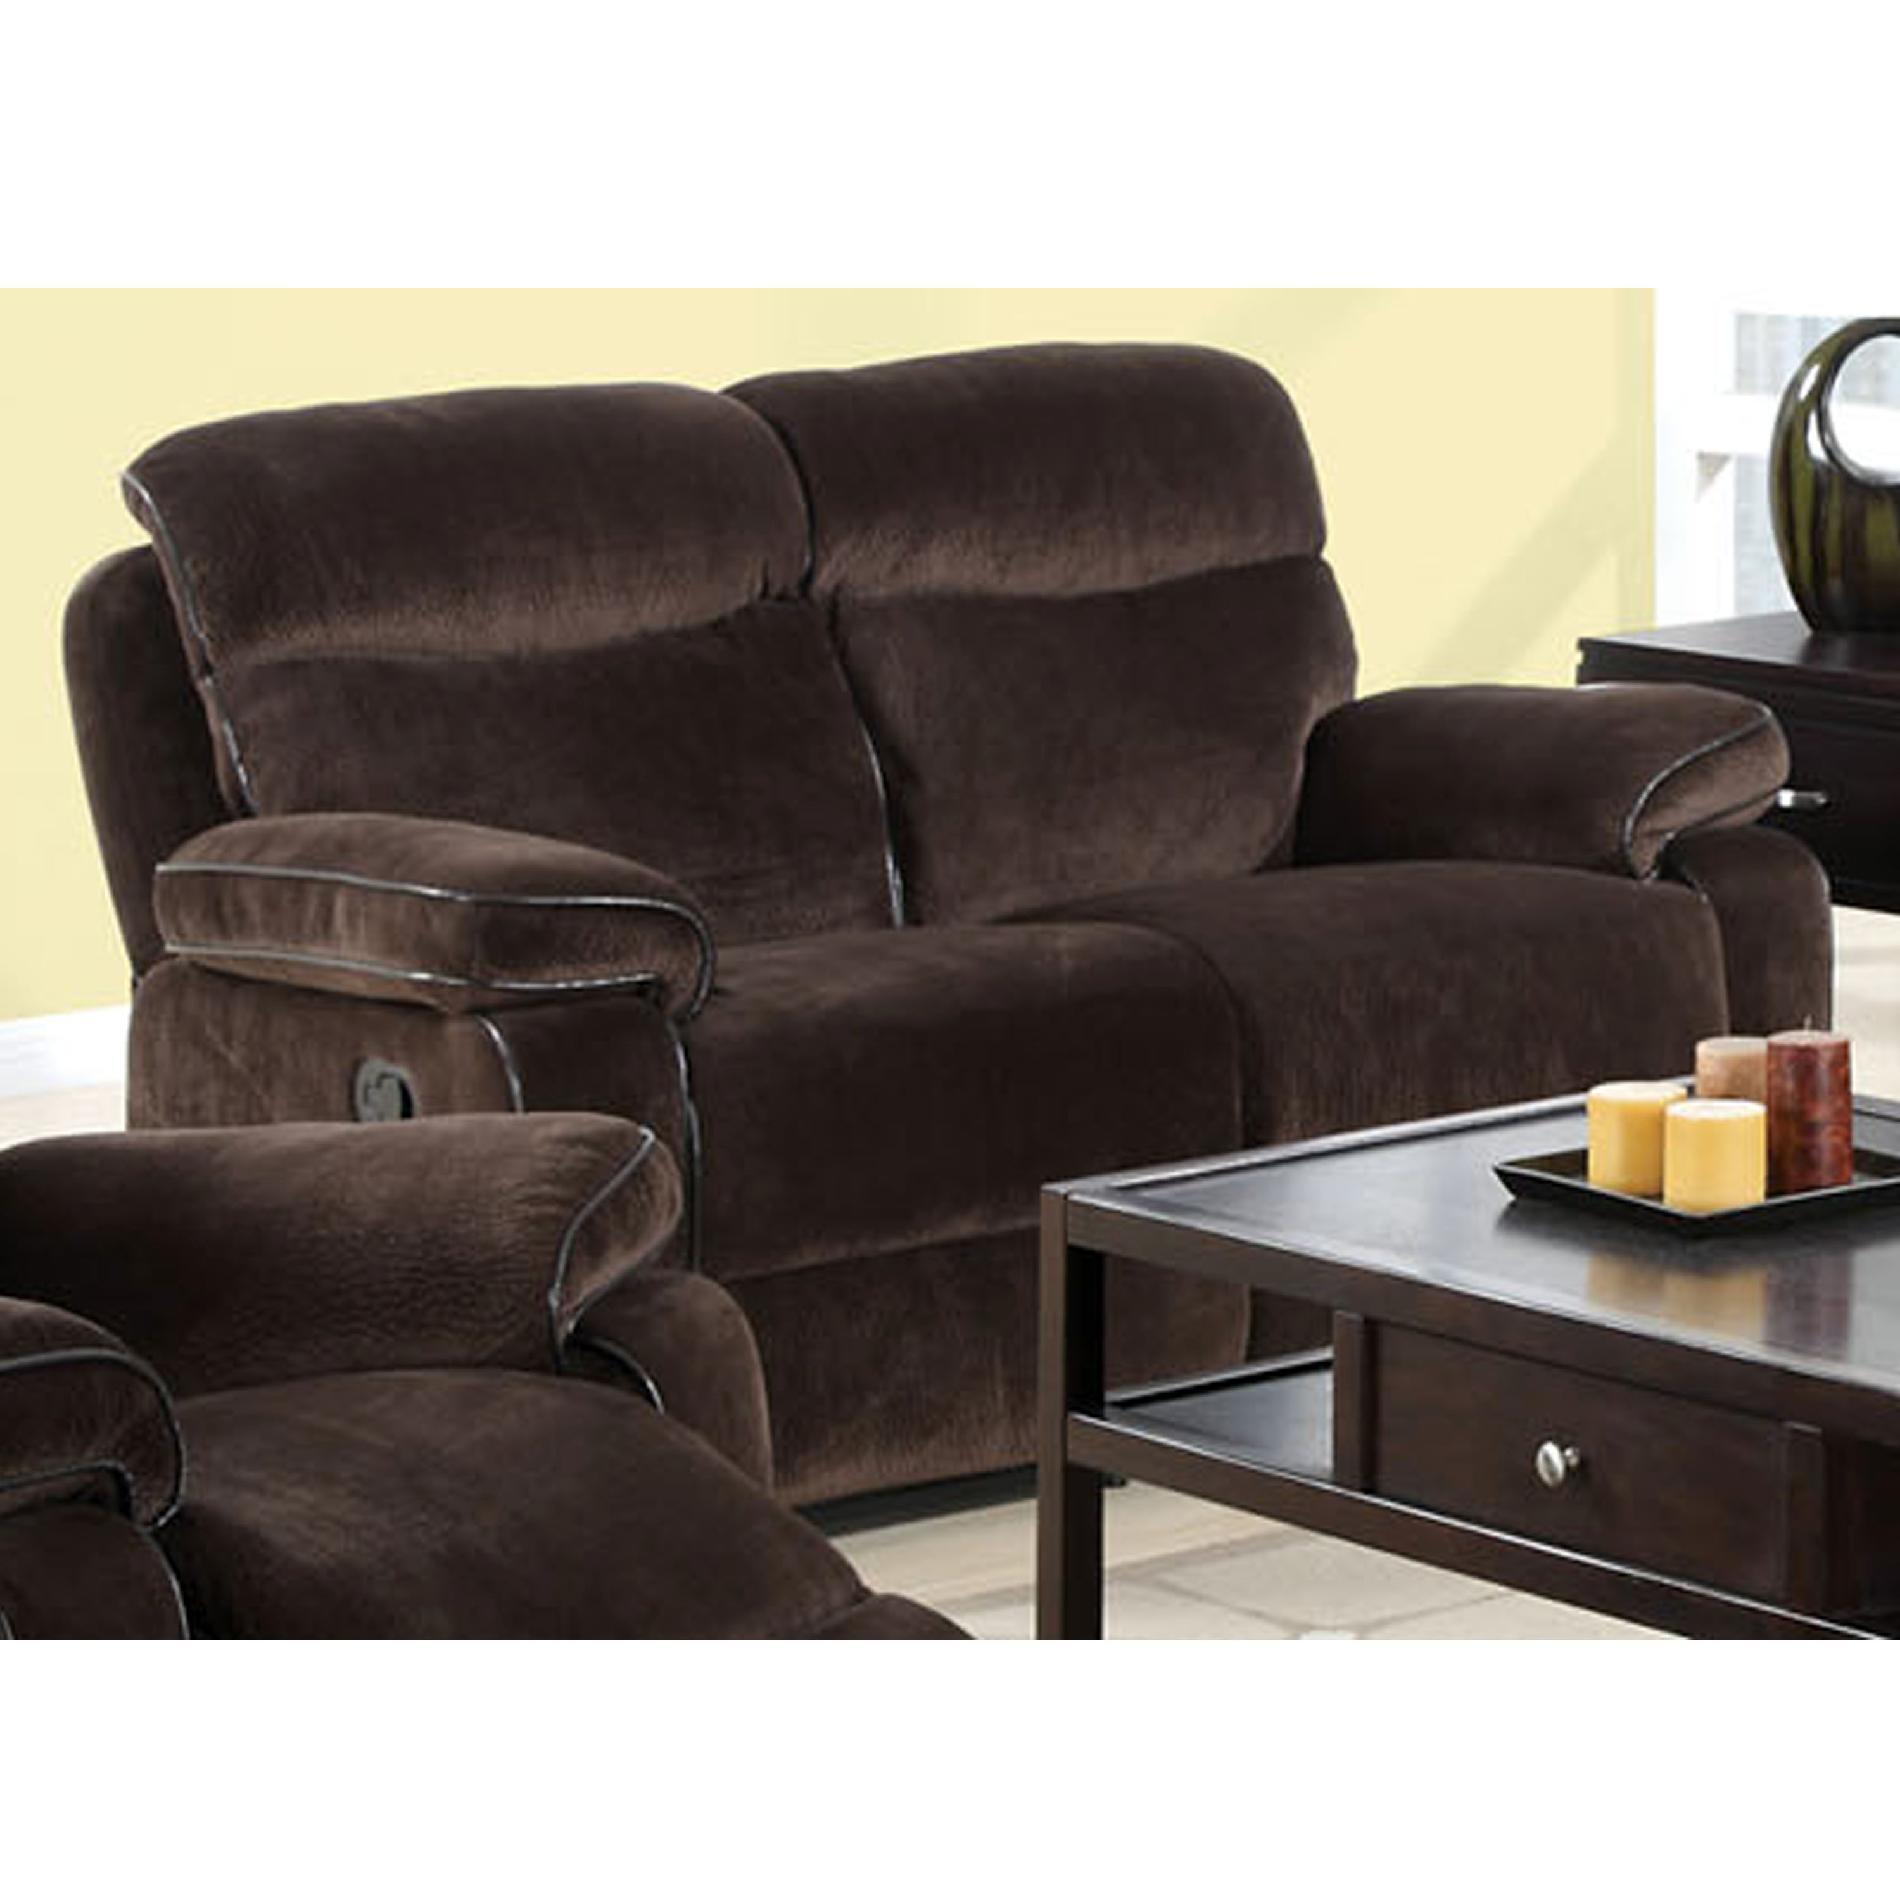 leather sofa bed sears charcoal grey set venetian worldwide cm6556 s winslow bonded